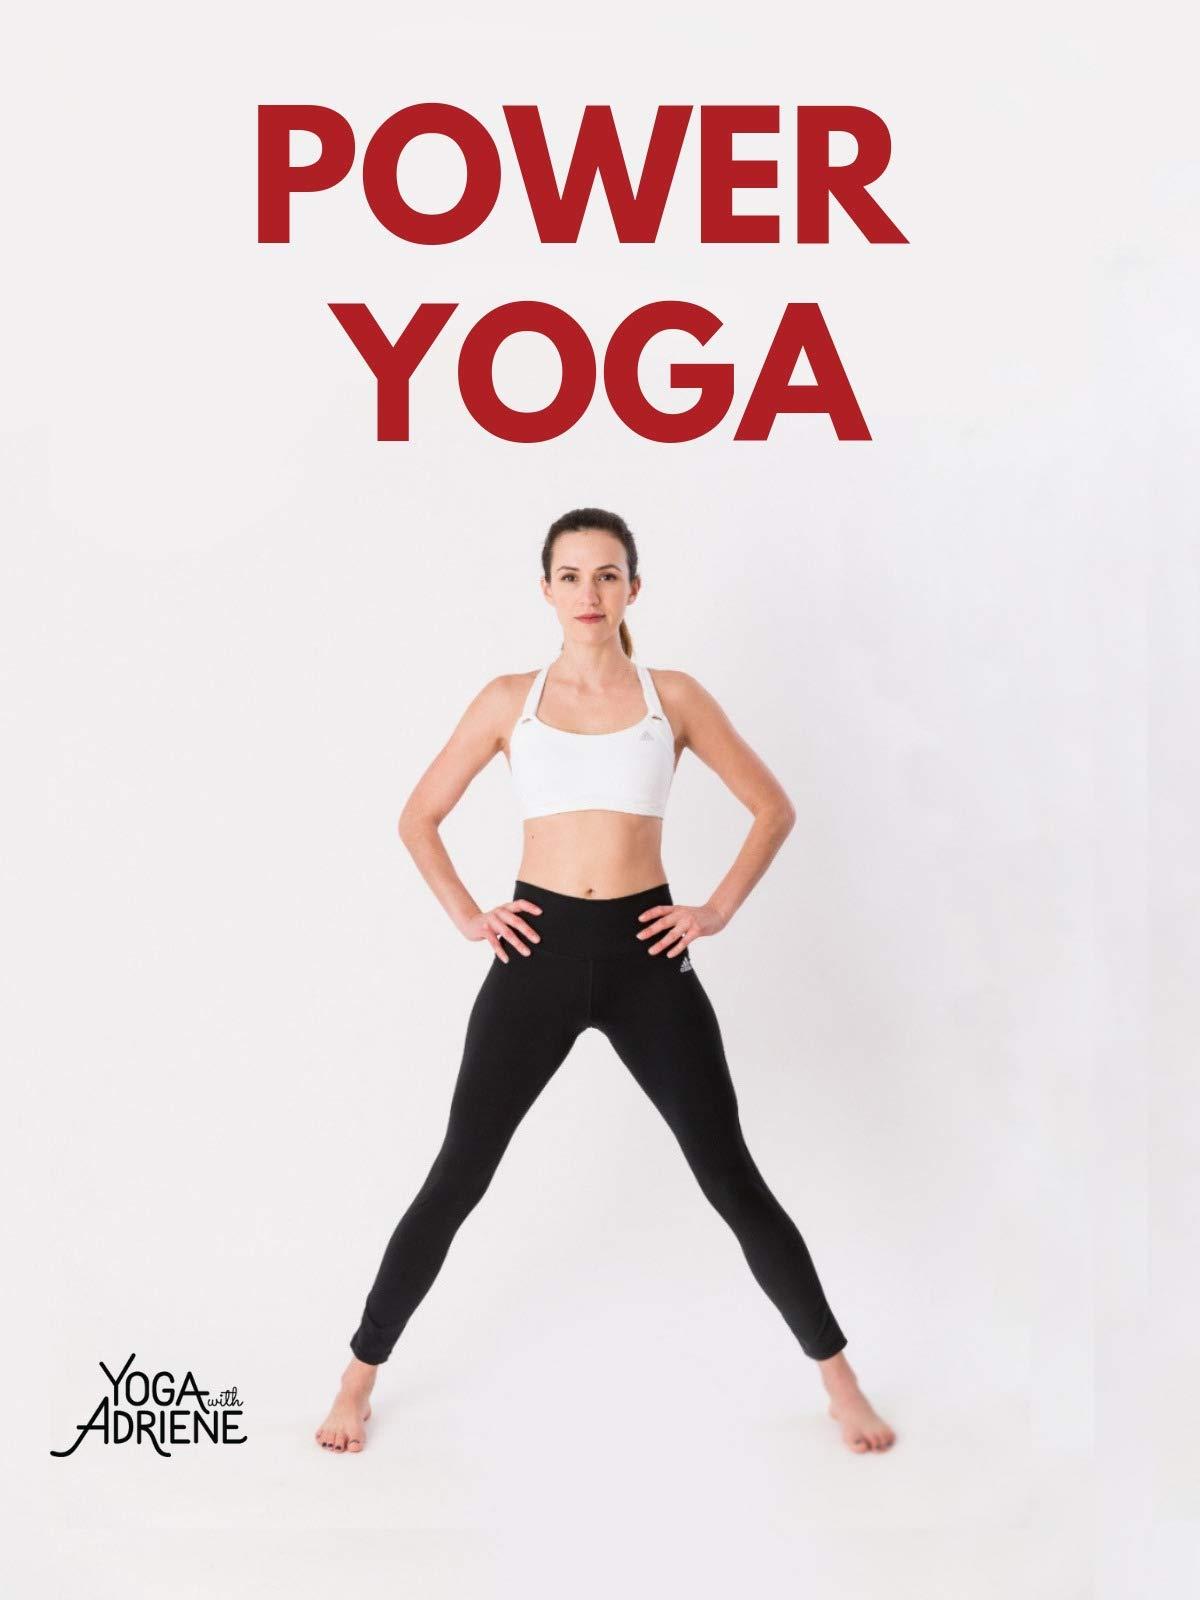 Amazon.com: Watch Yoga With Adriene: Power Yoga   Prime Video